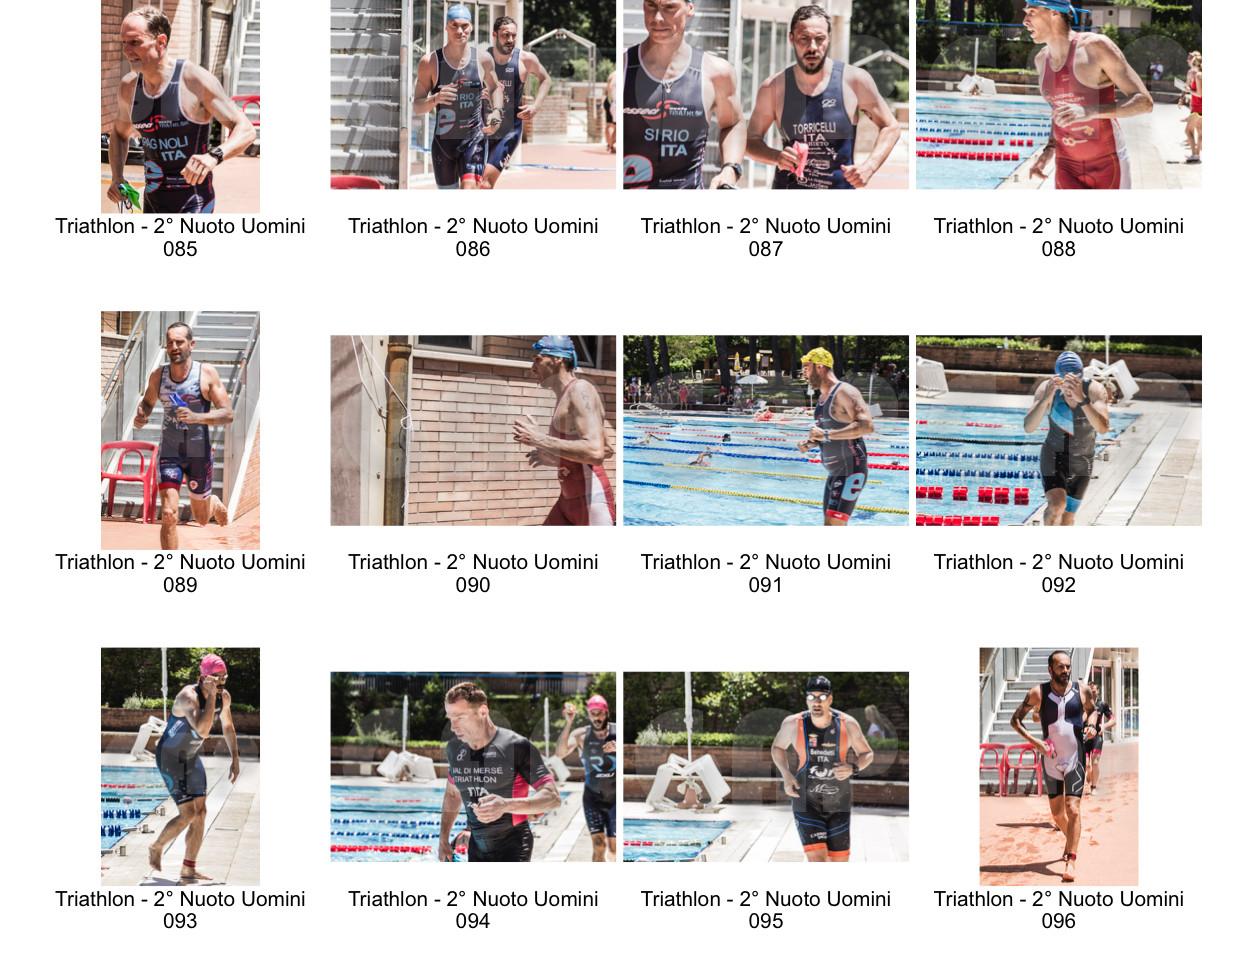 Triathlon_V.Elsa_-_2°_Frazione_Nuoto_Uomini_-5.jpg